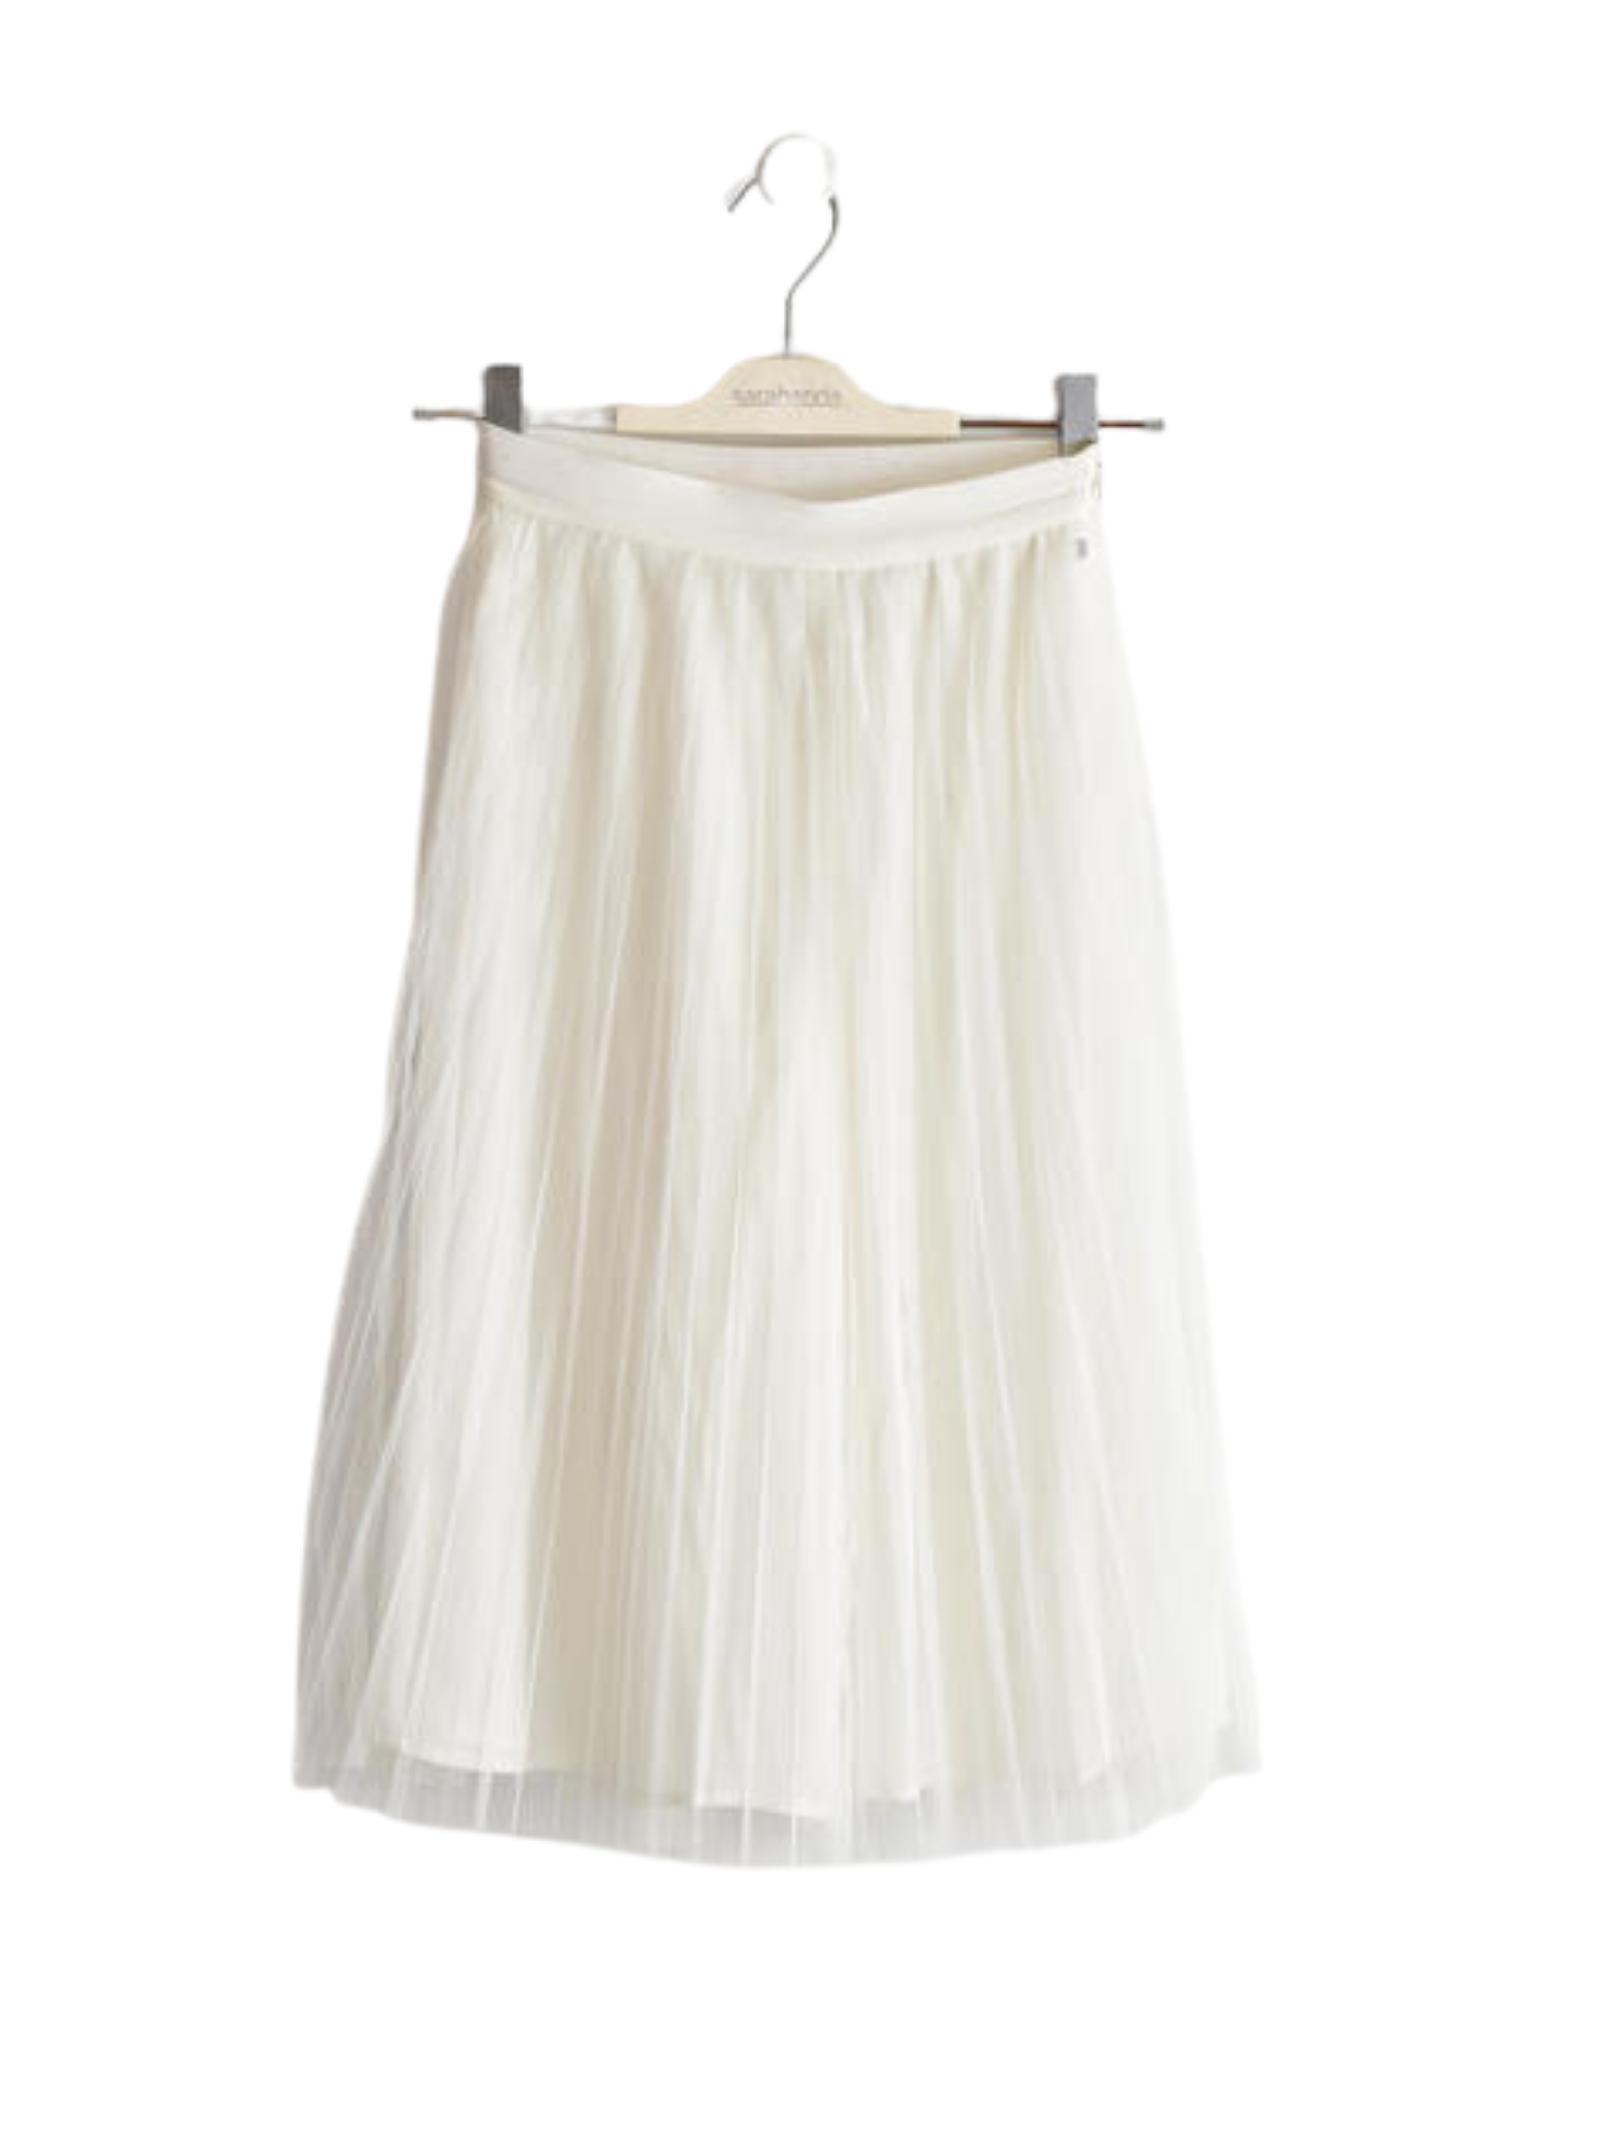 SARABANDA | Trousers | 02417000112